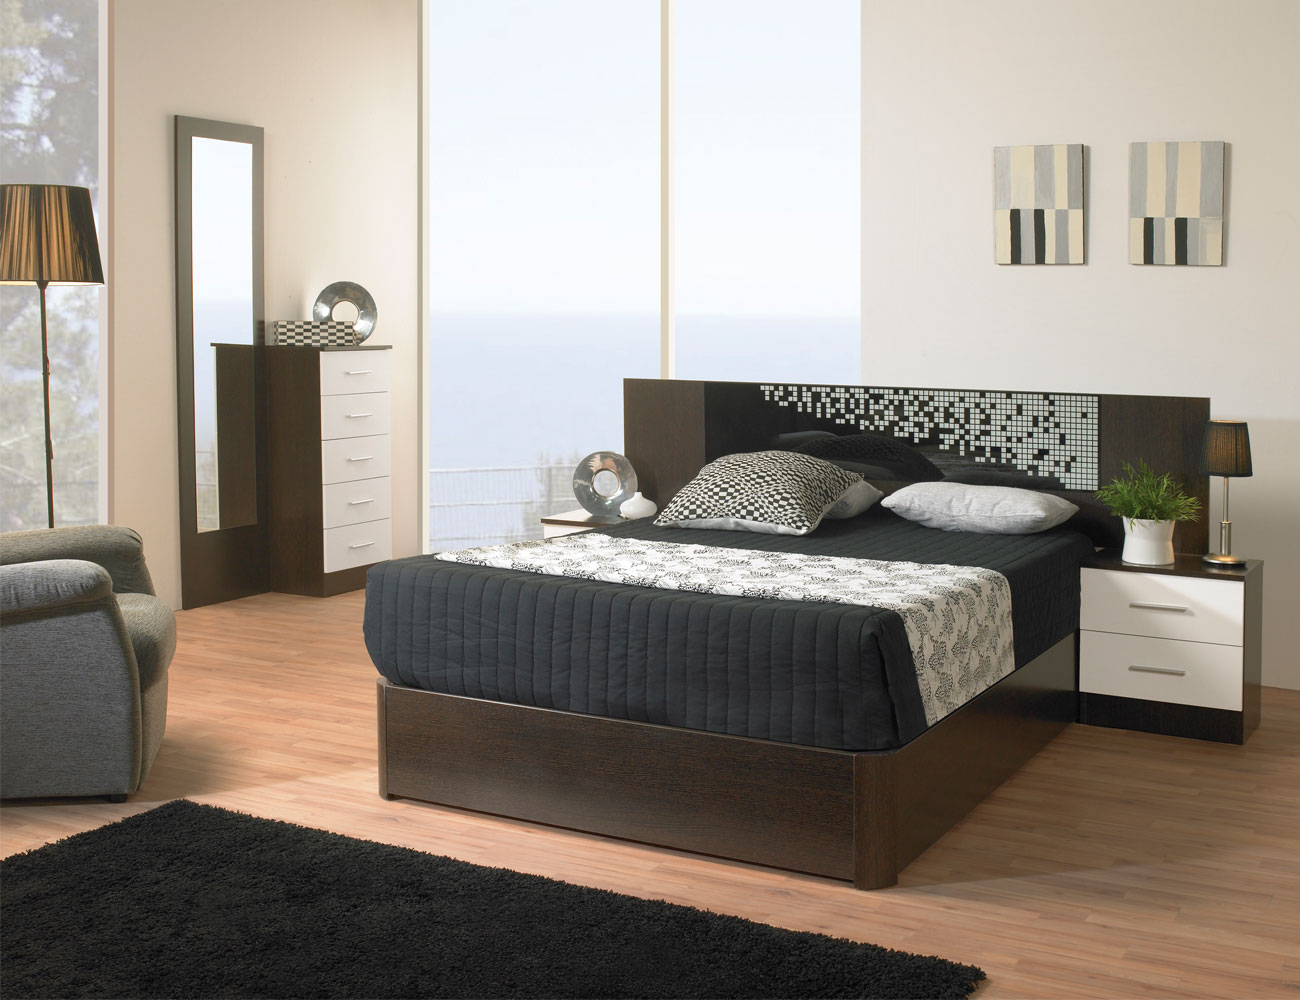 Dormitorio matrimonio estilo moderno tibet wengue negro